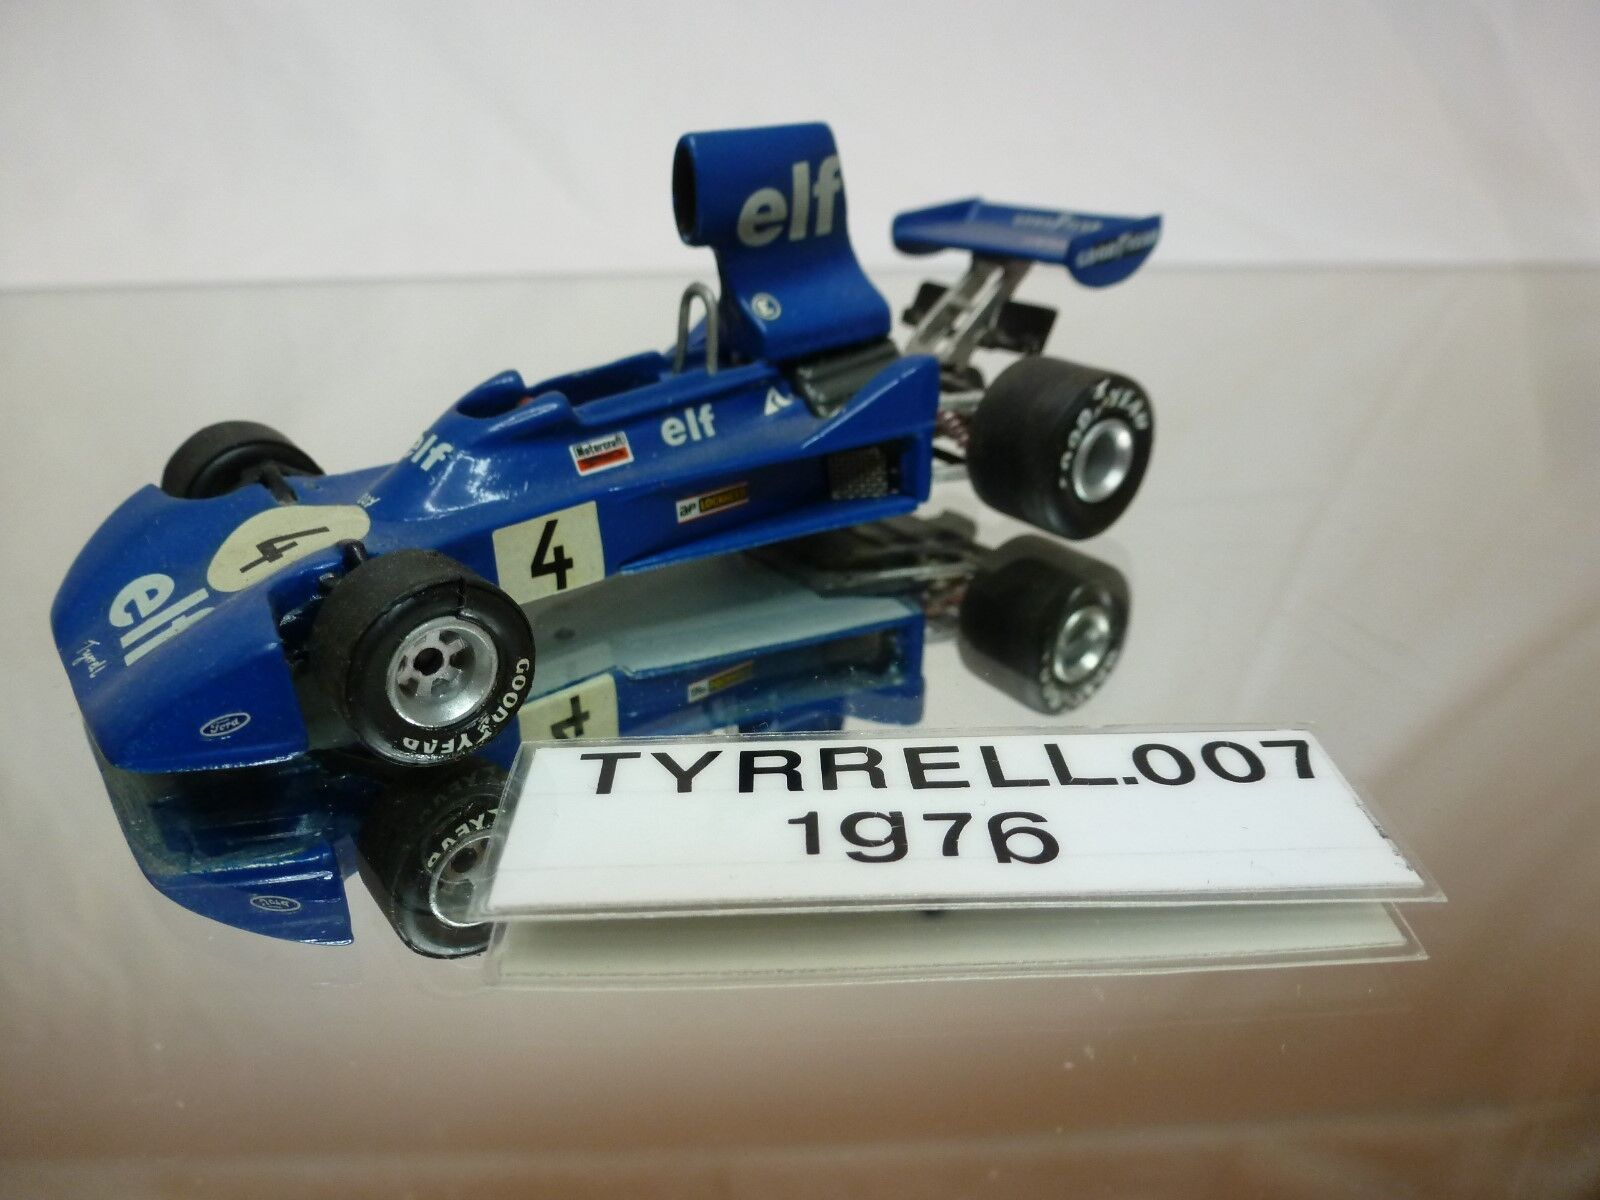 TYRRELL 007  1976 F1 DEPAILLER  -  KIT  (built)  - RARE  1 43 - NICE CONDITION  en ligne pas cher